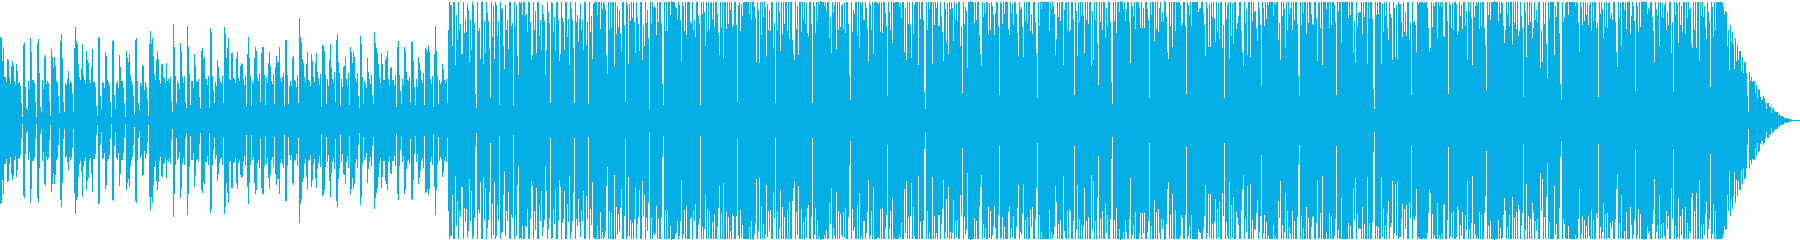 electronicの再生済みの波形